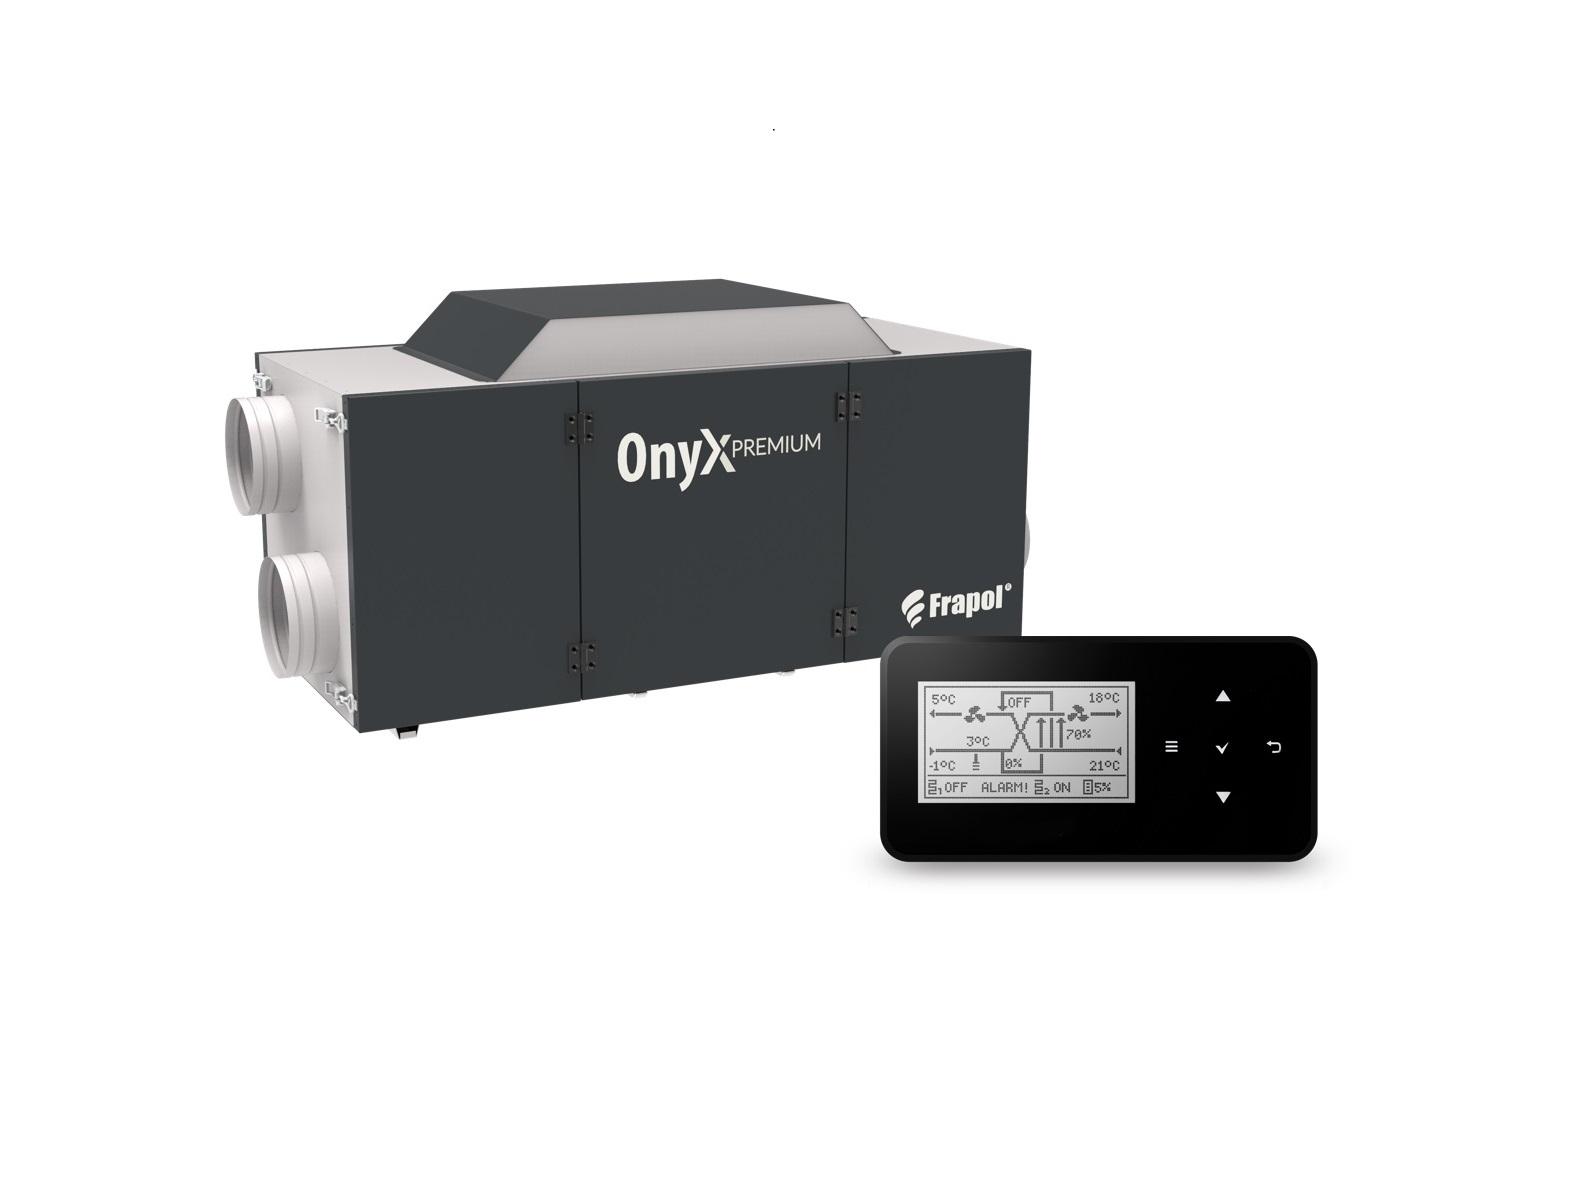 Onyx Premium 500